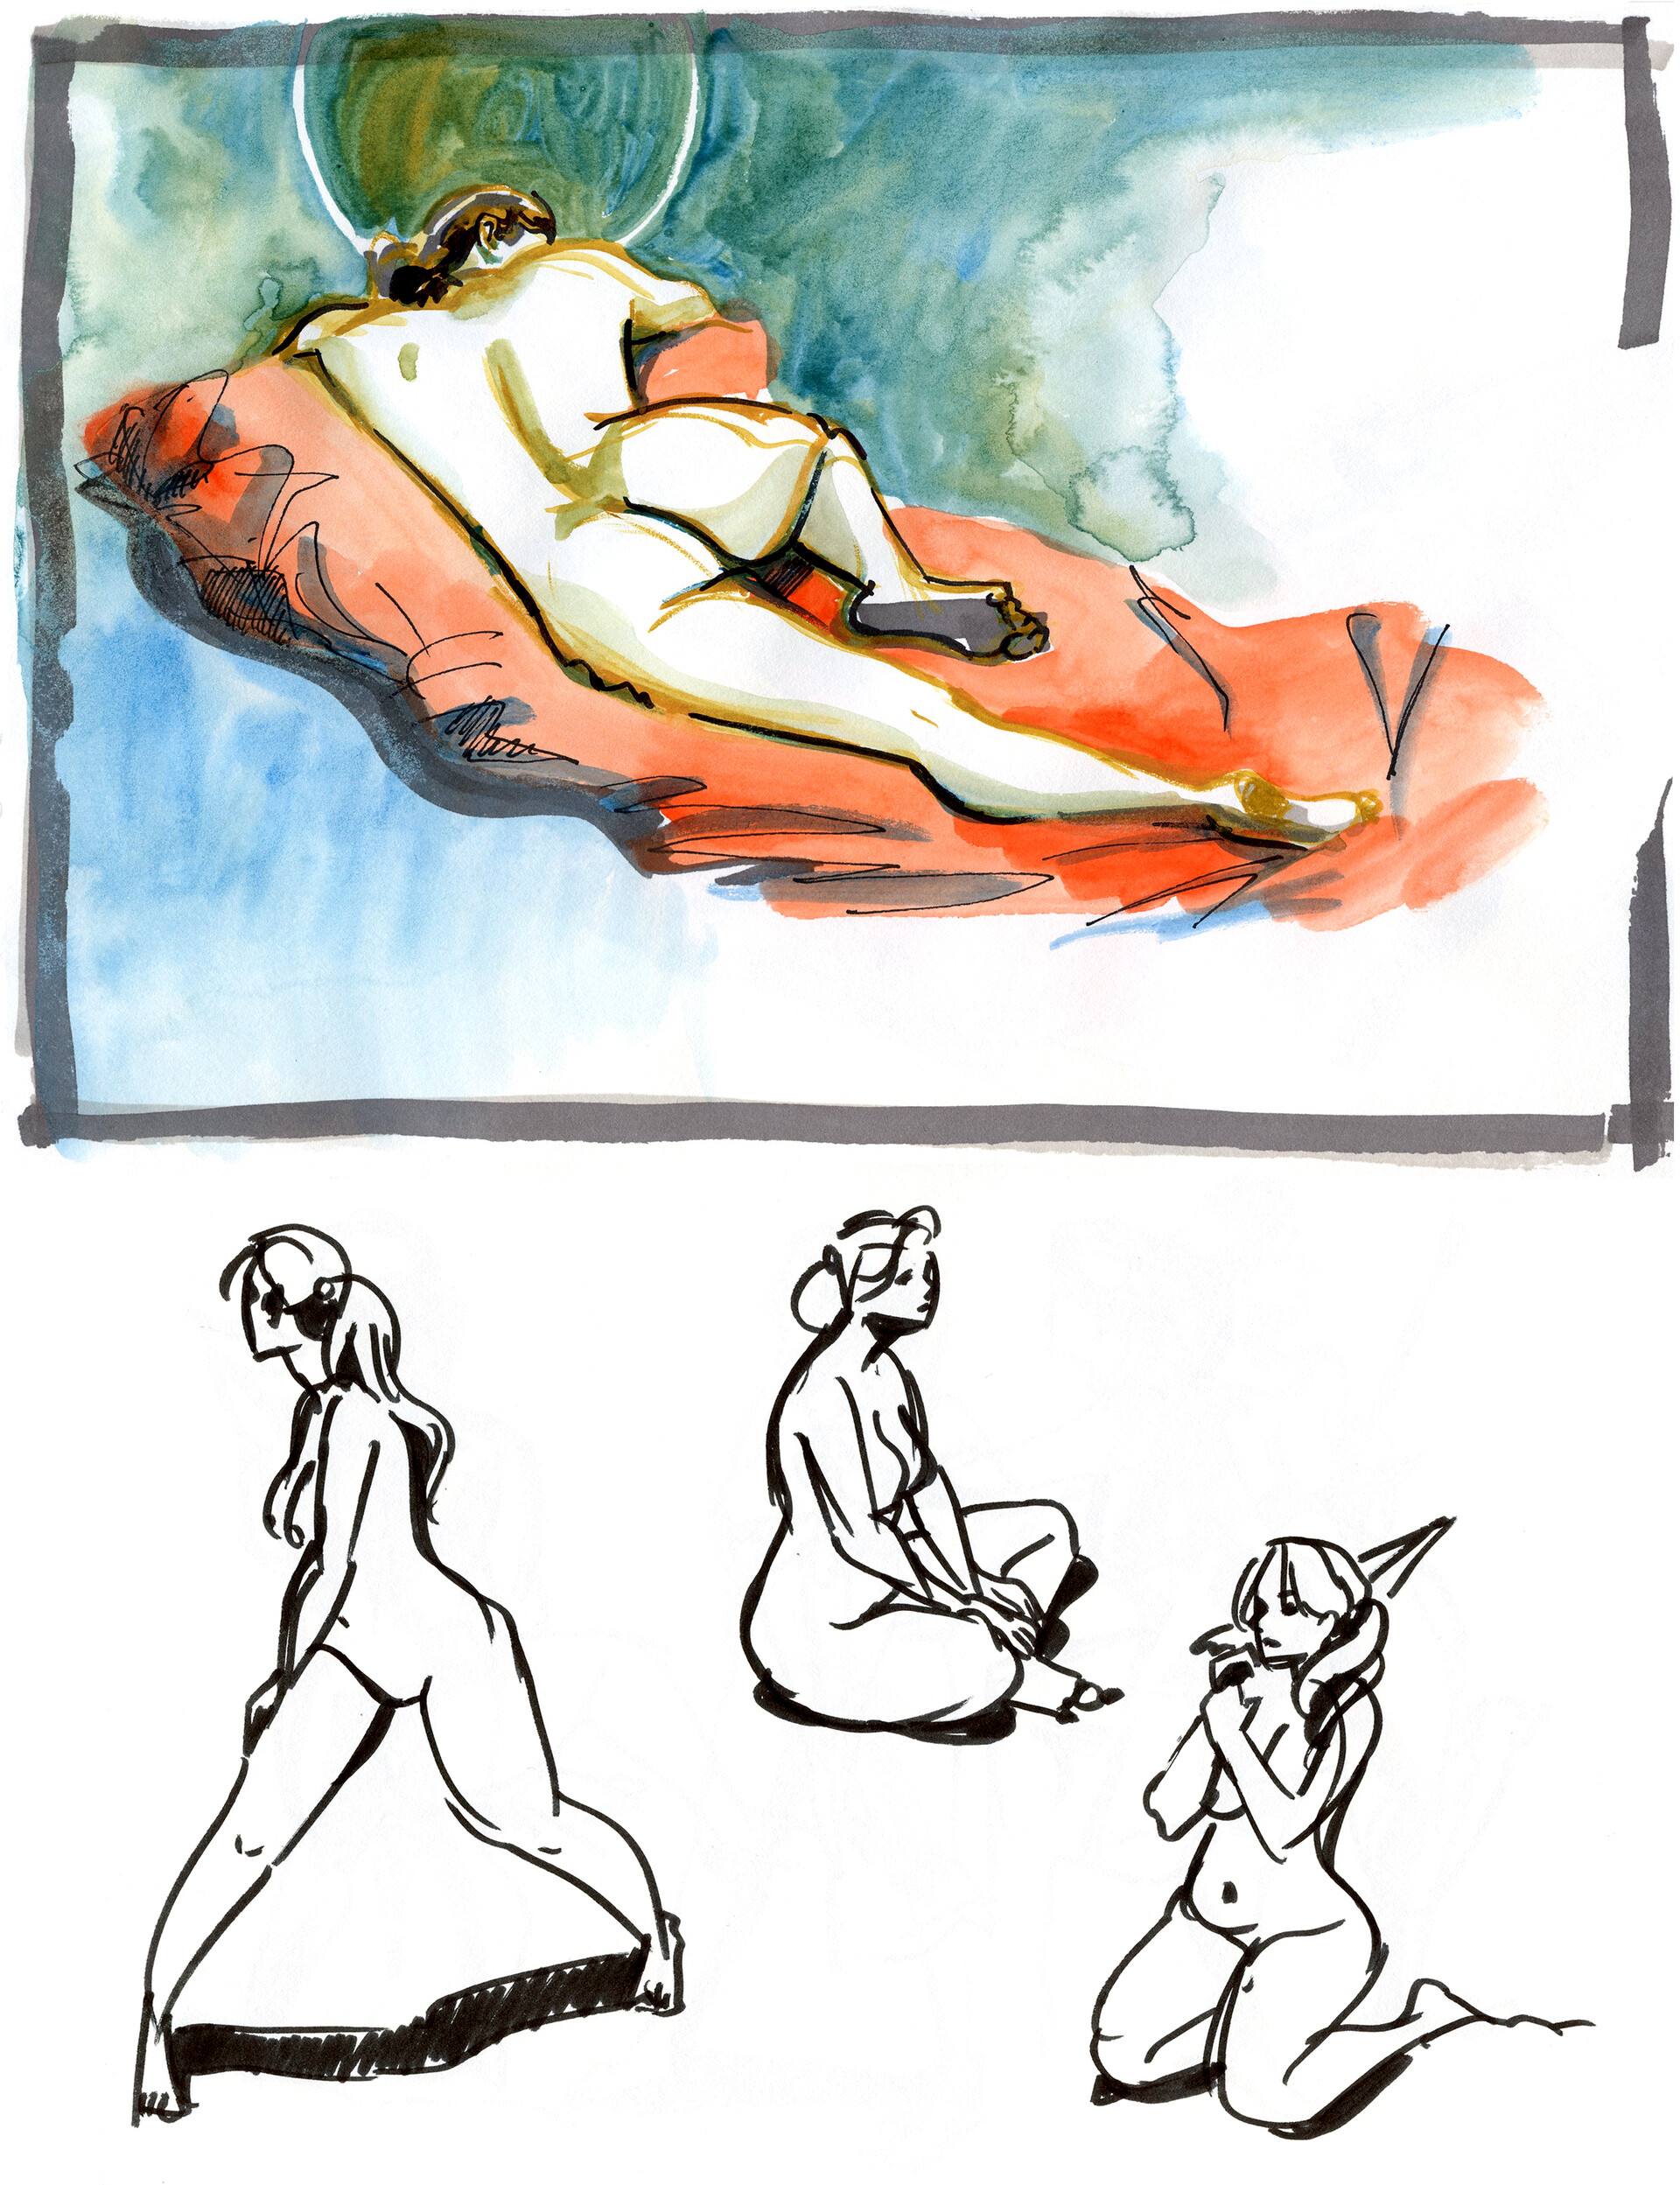 Elisa moriconi 3 06 giugno girl ink w studies 04